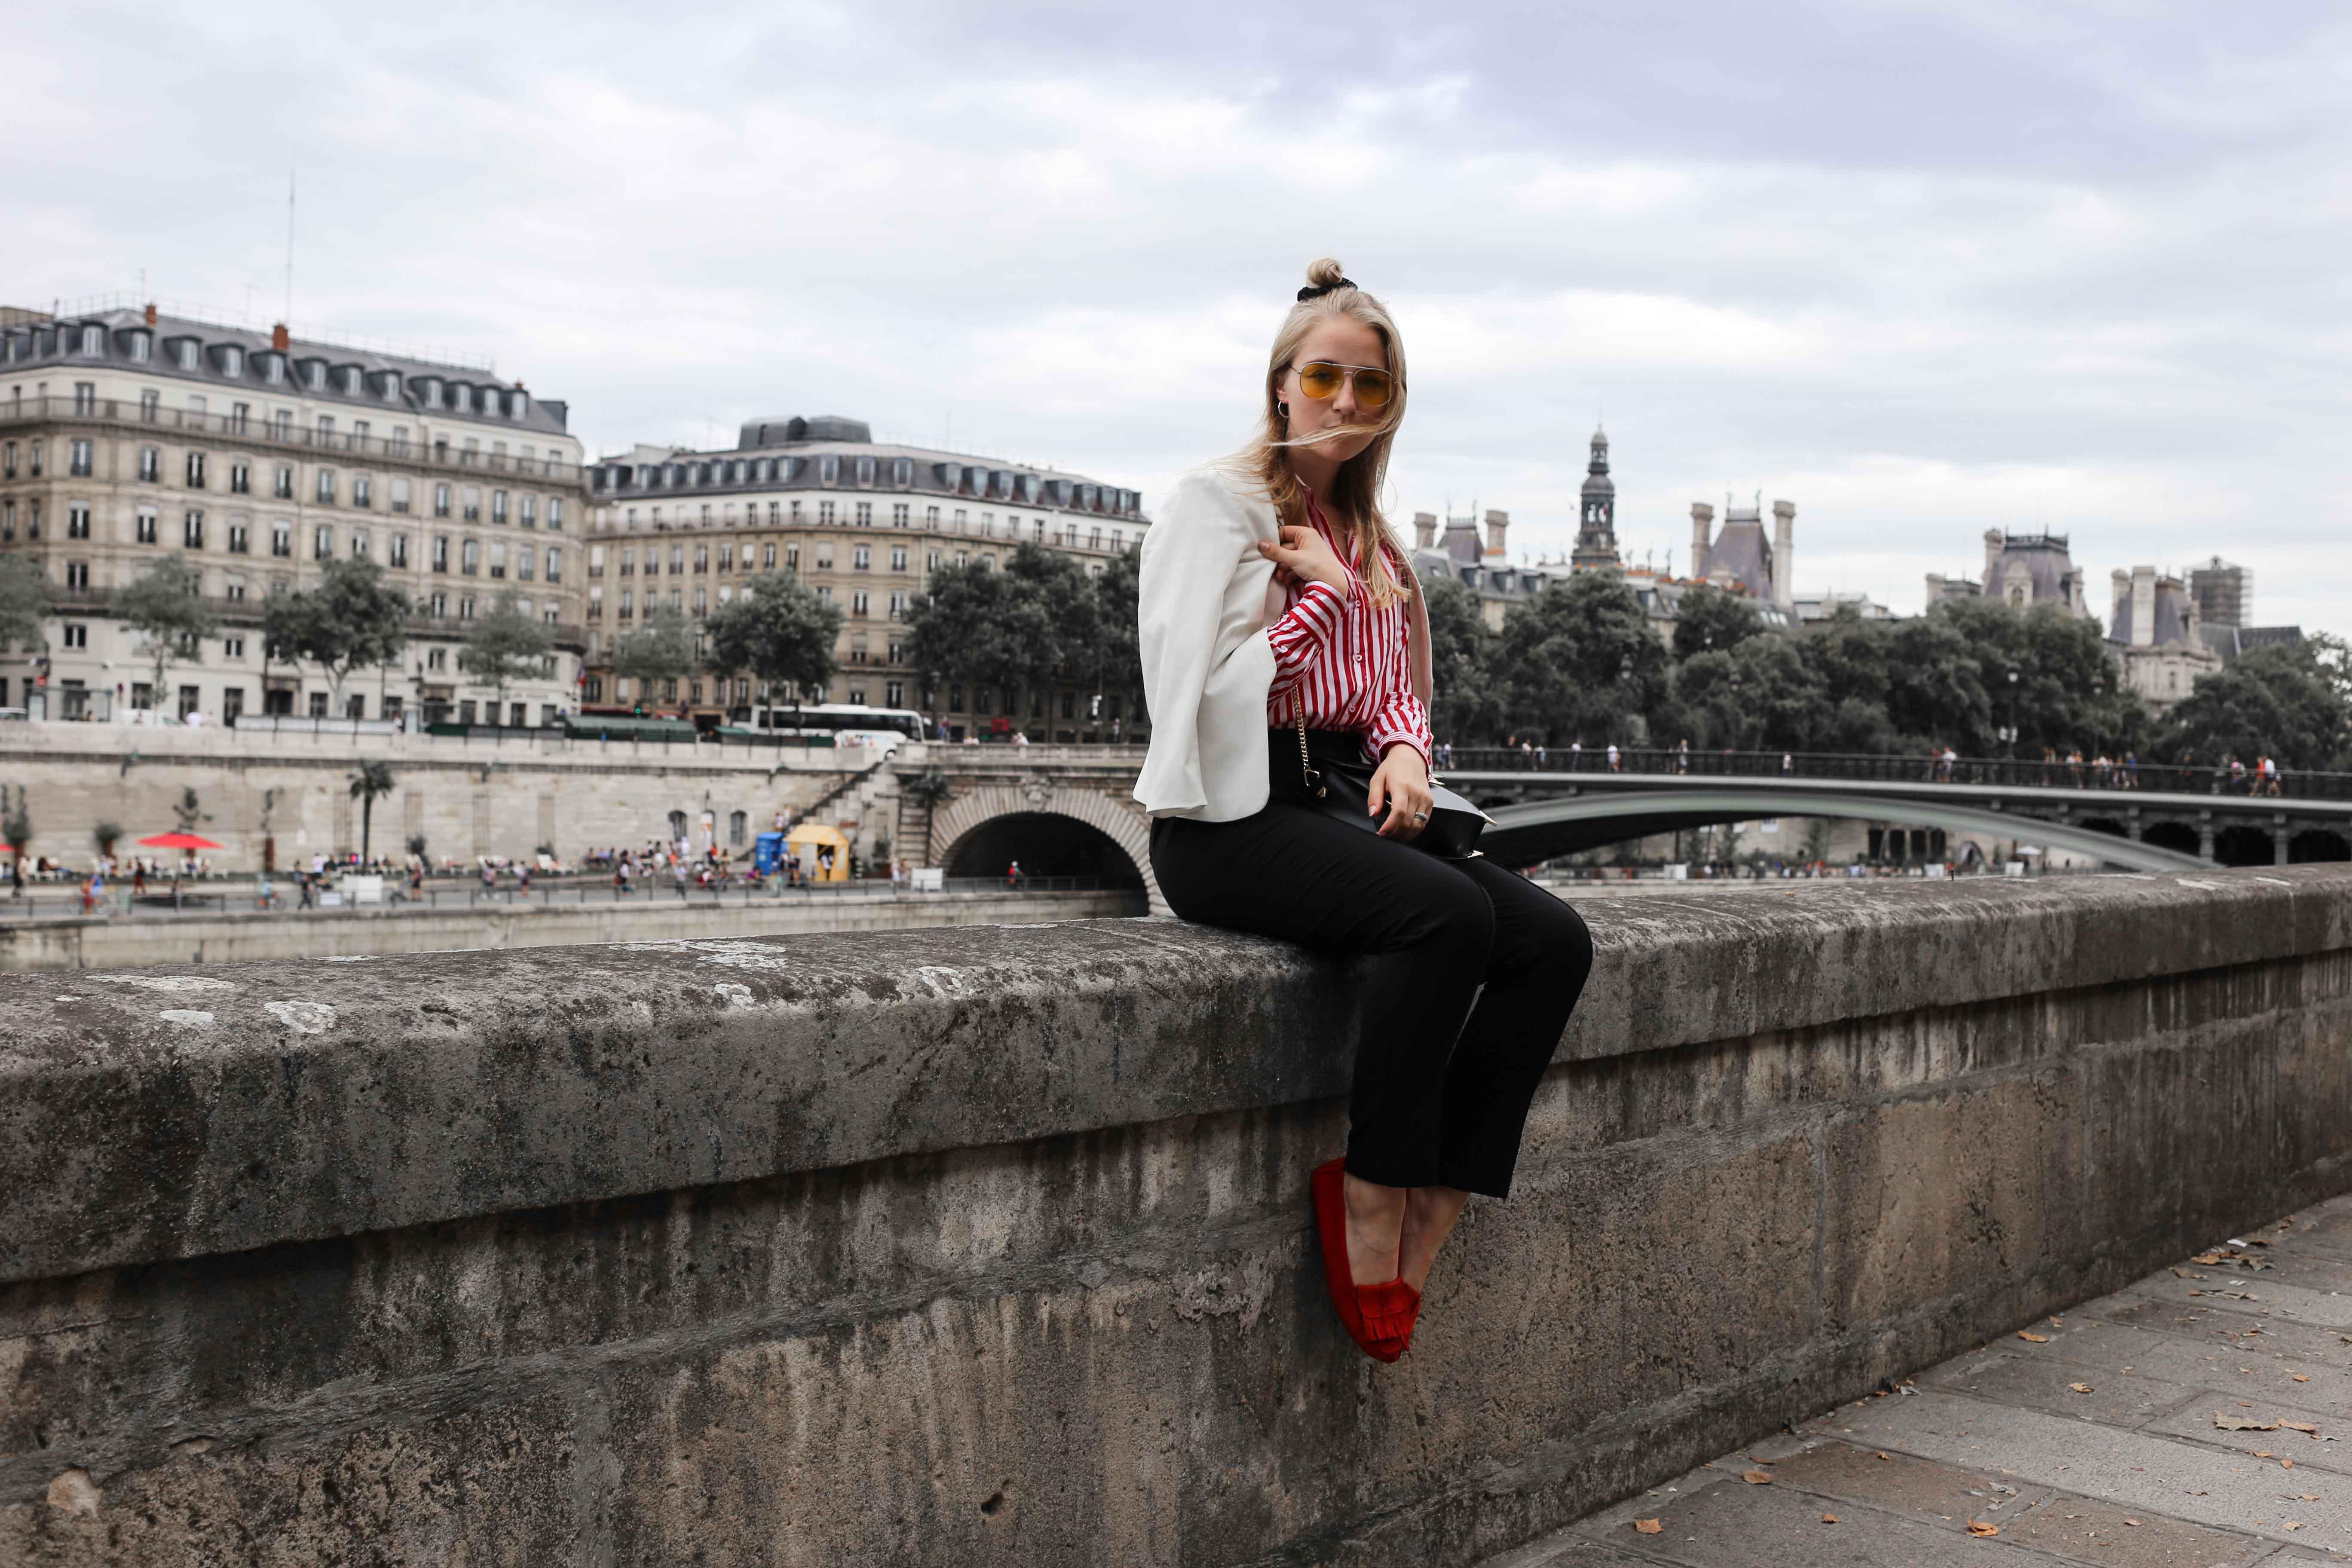 rote-mokassins-streifenbluse-weißer-blazer-paris-modeblog-fashionblog-fashion-blog_1428